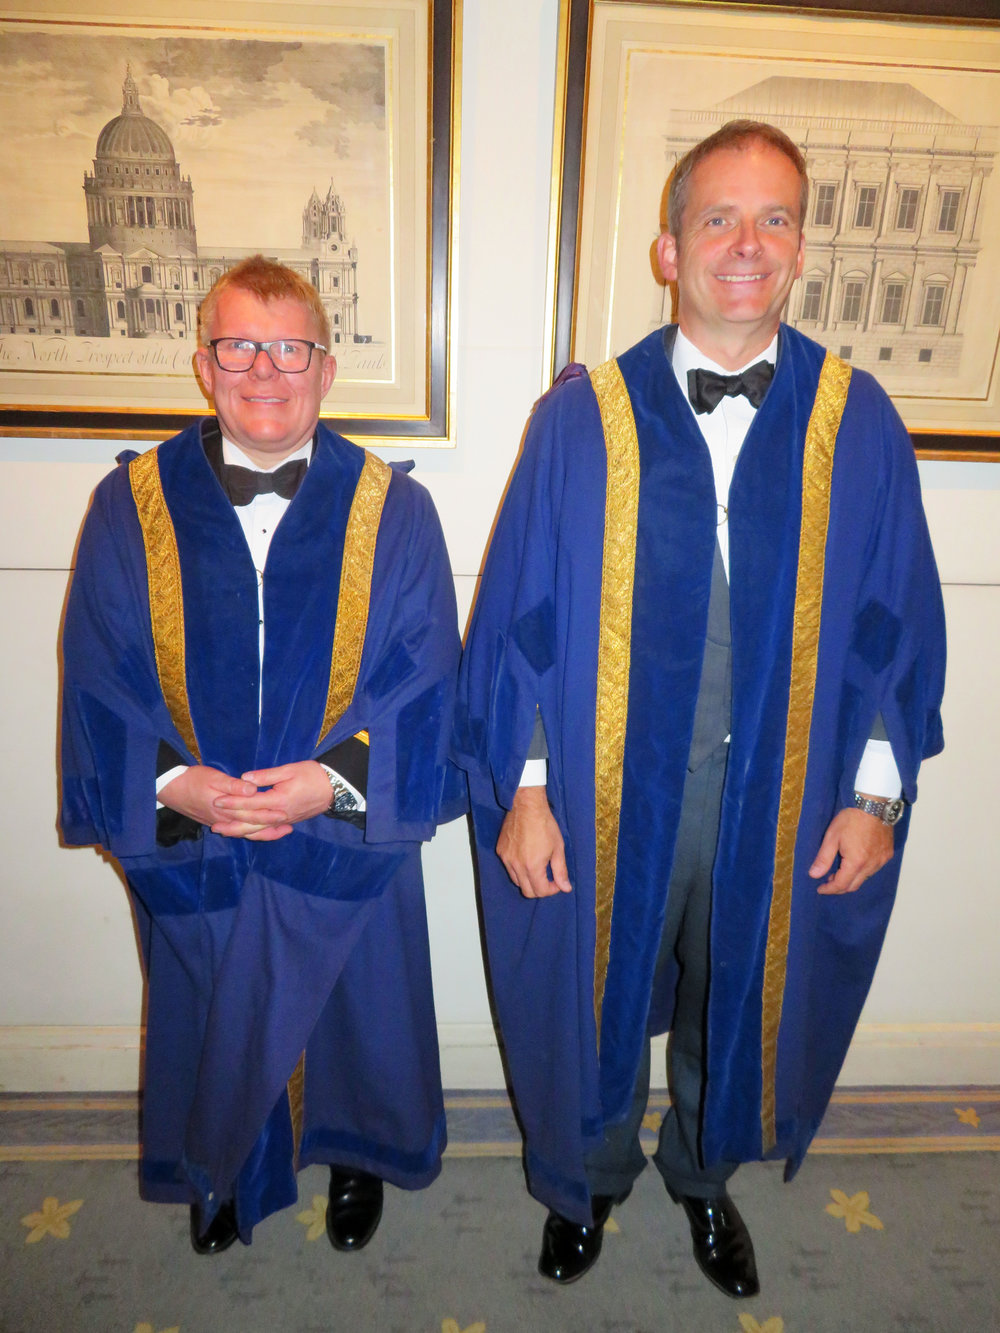 Liverymen Alistair Marshall & Michael Carver